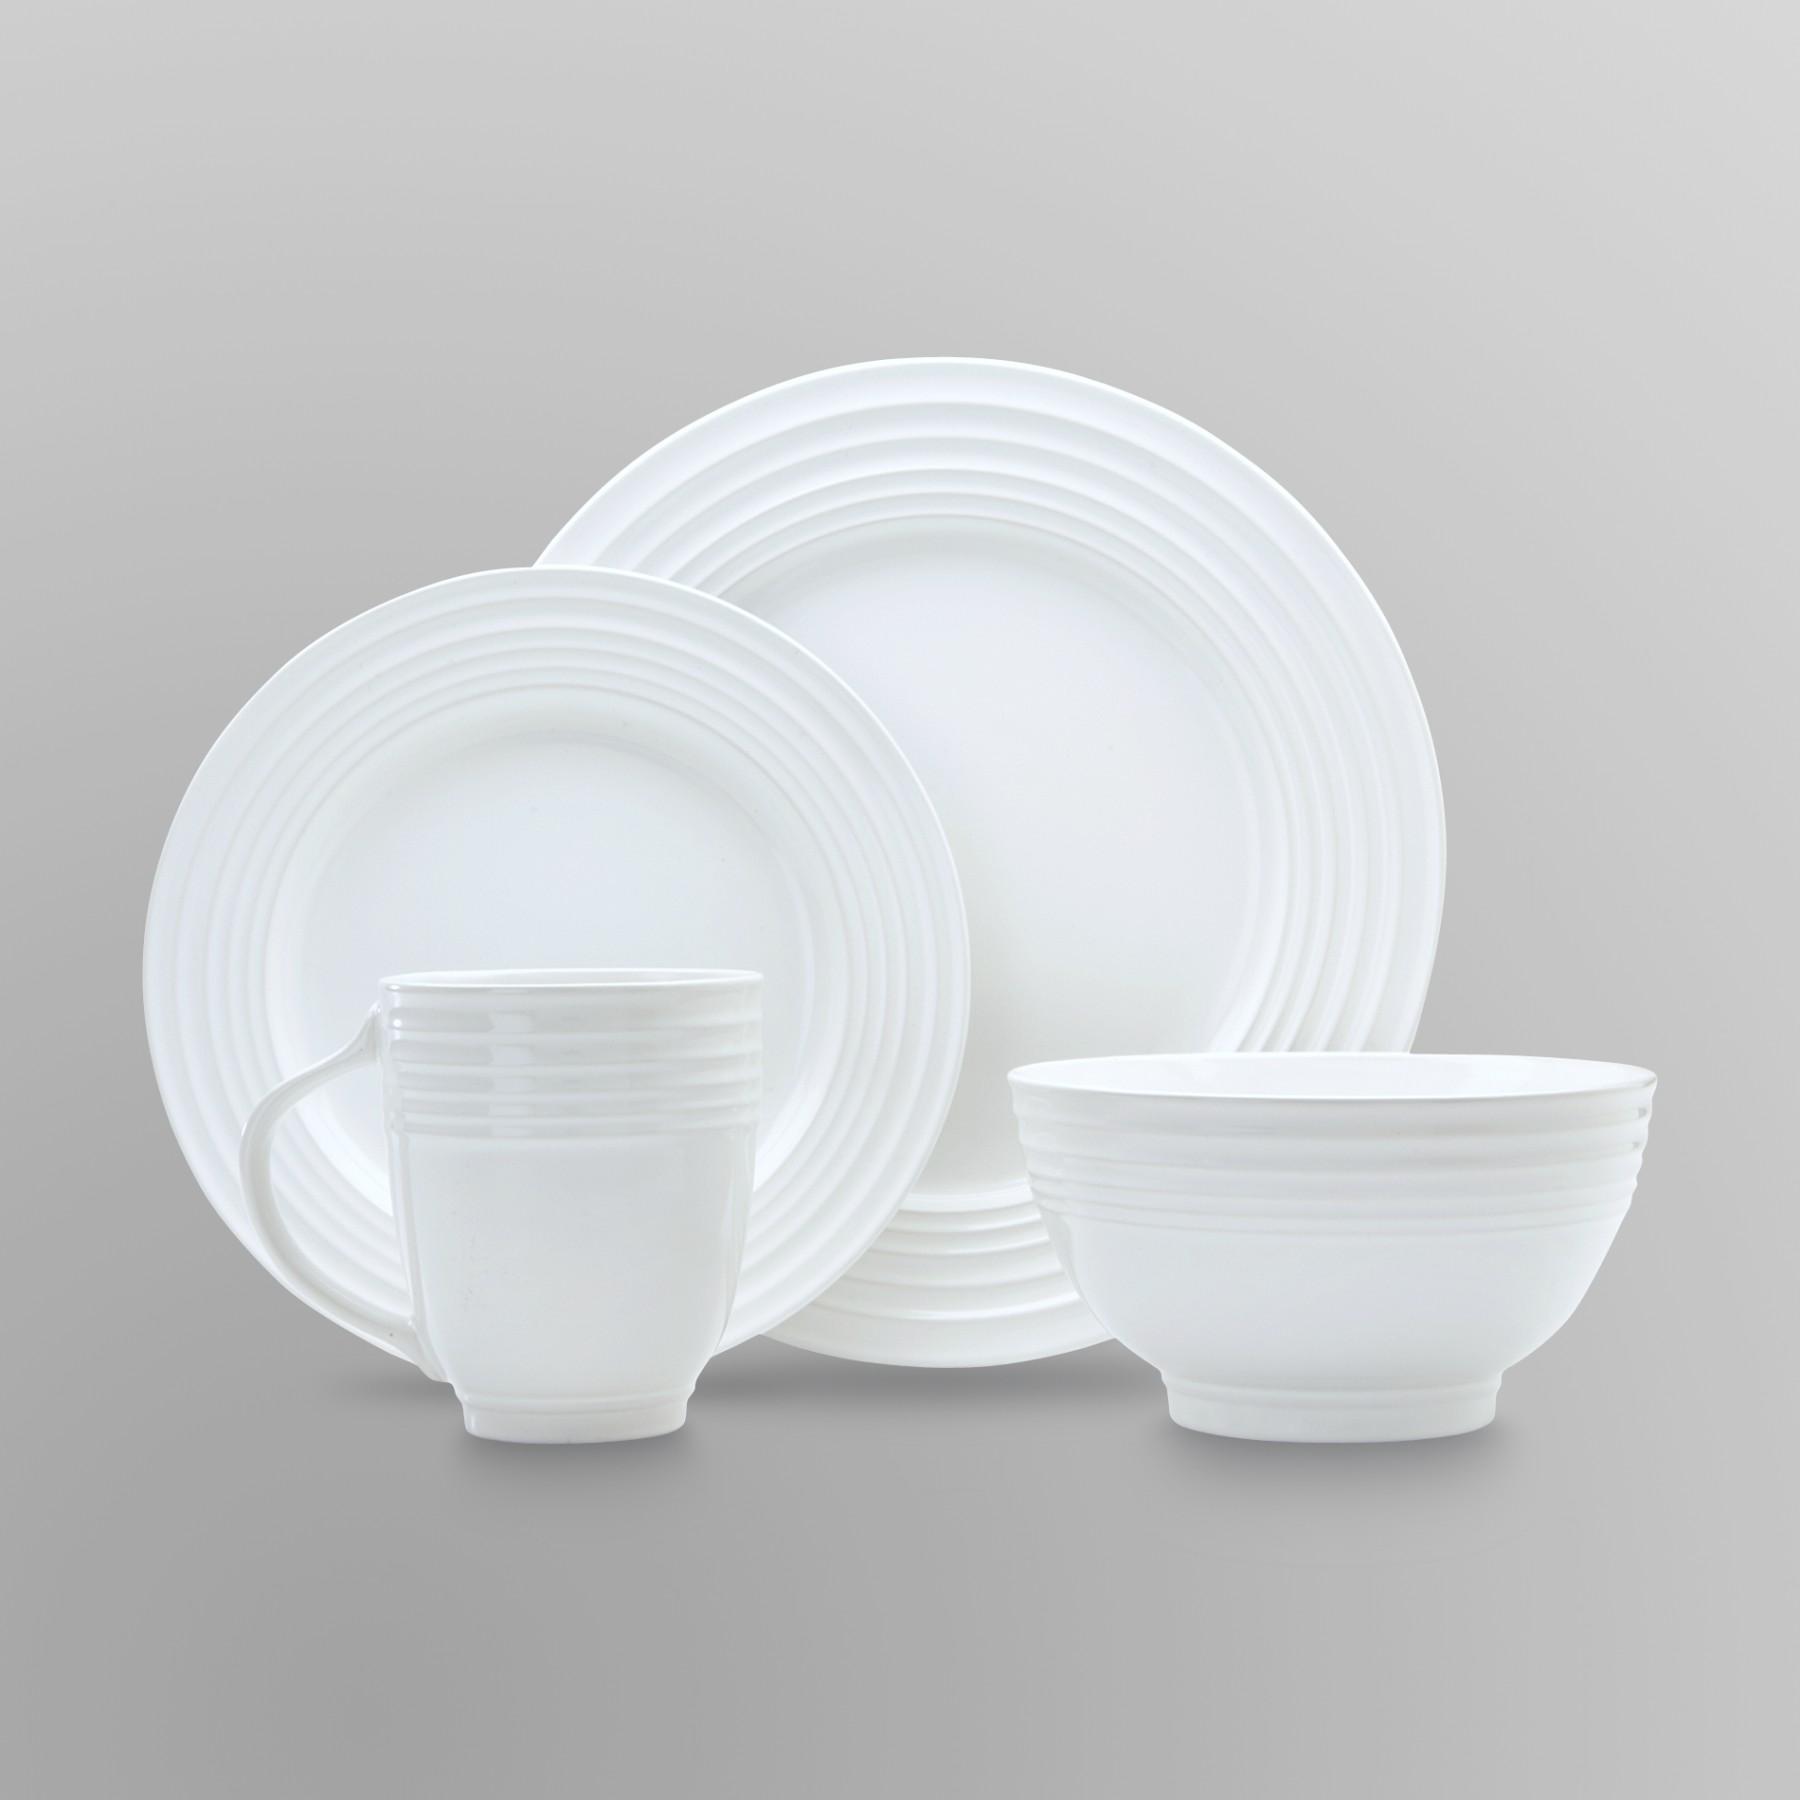 Essential Home 16-Piece Solid Color Dinnerware Set - Round PartNumber: 024VA56286312P MfgPartNumber: 90908.16